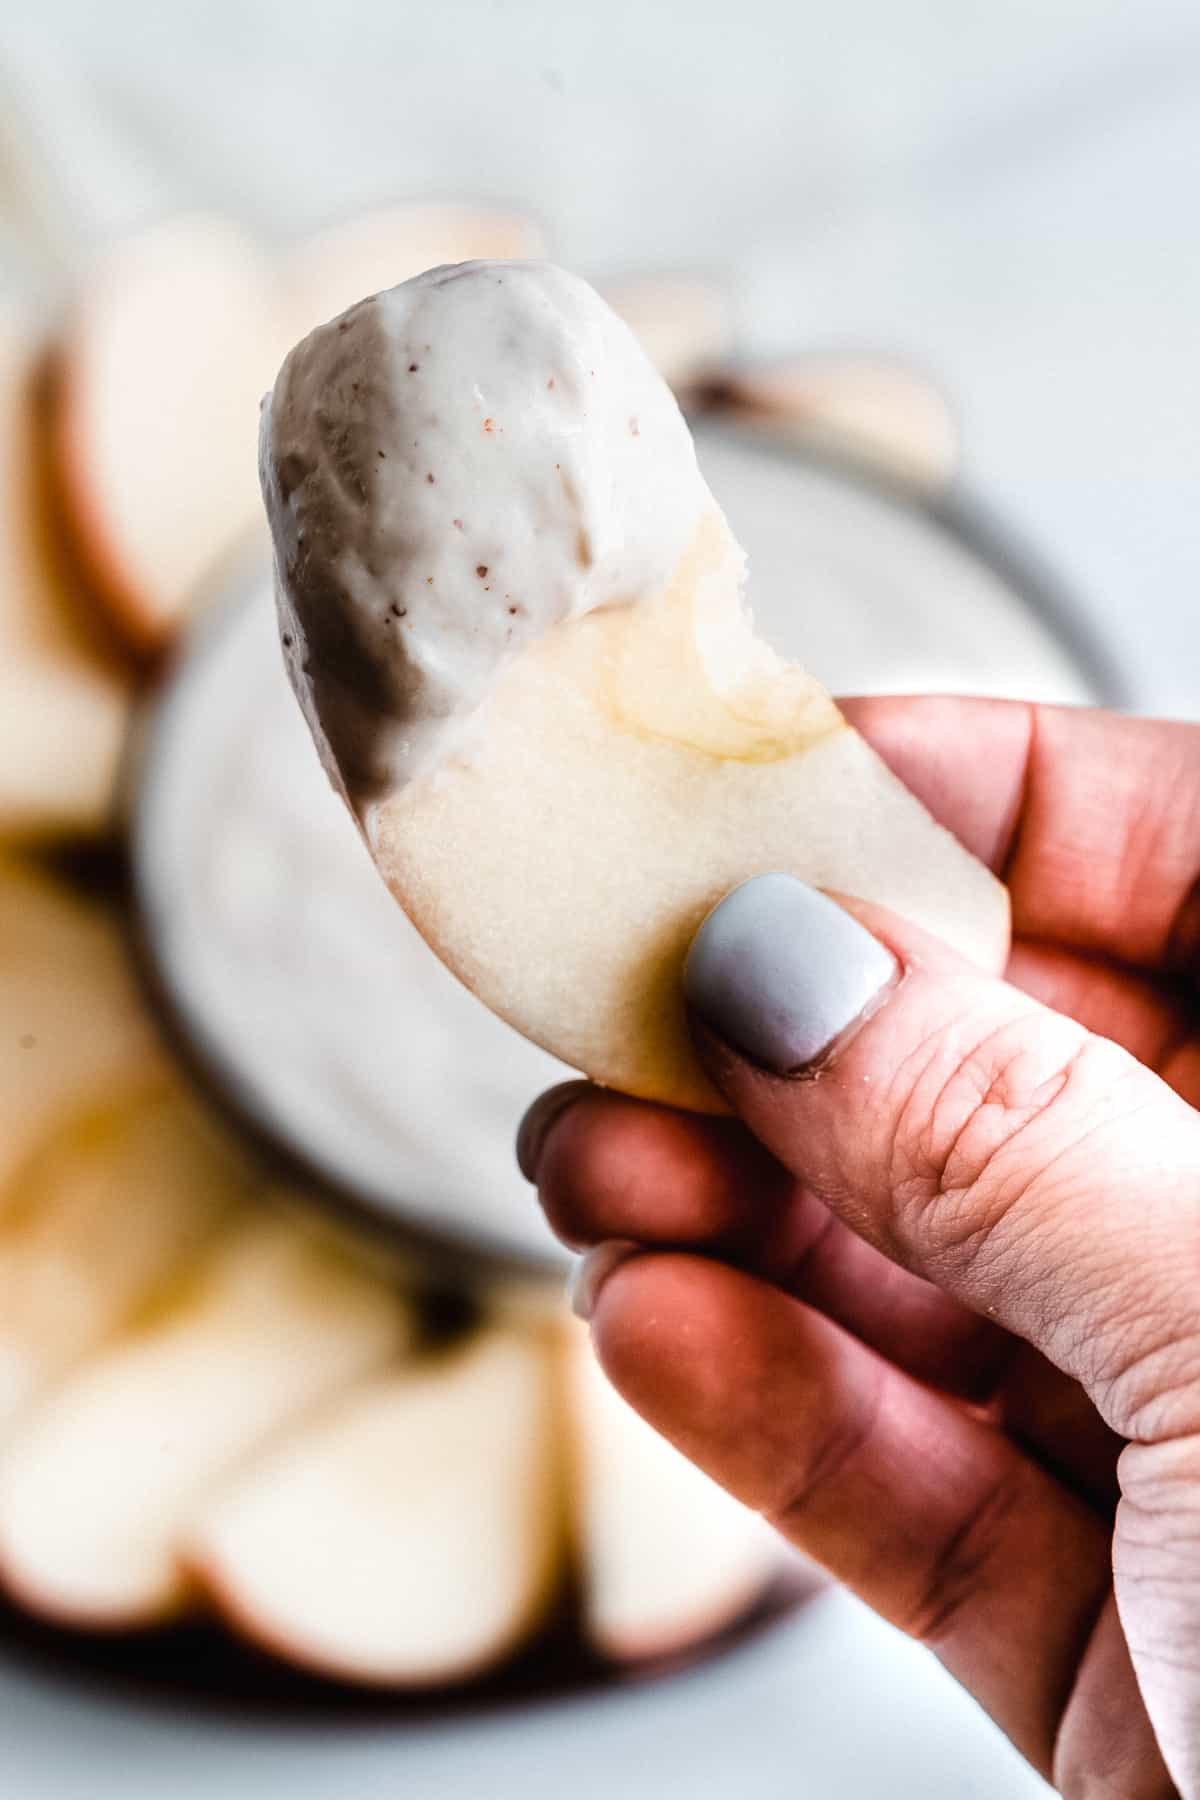 Hand holding apple slice with greek yogurt dip.